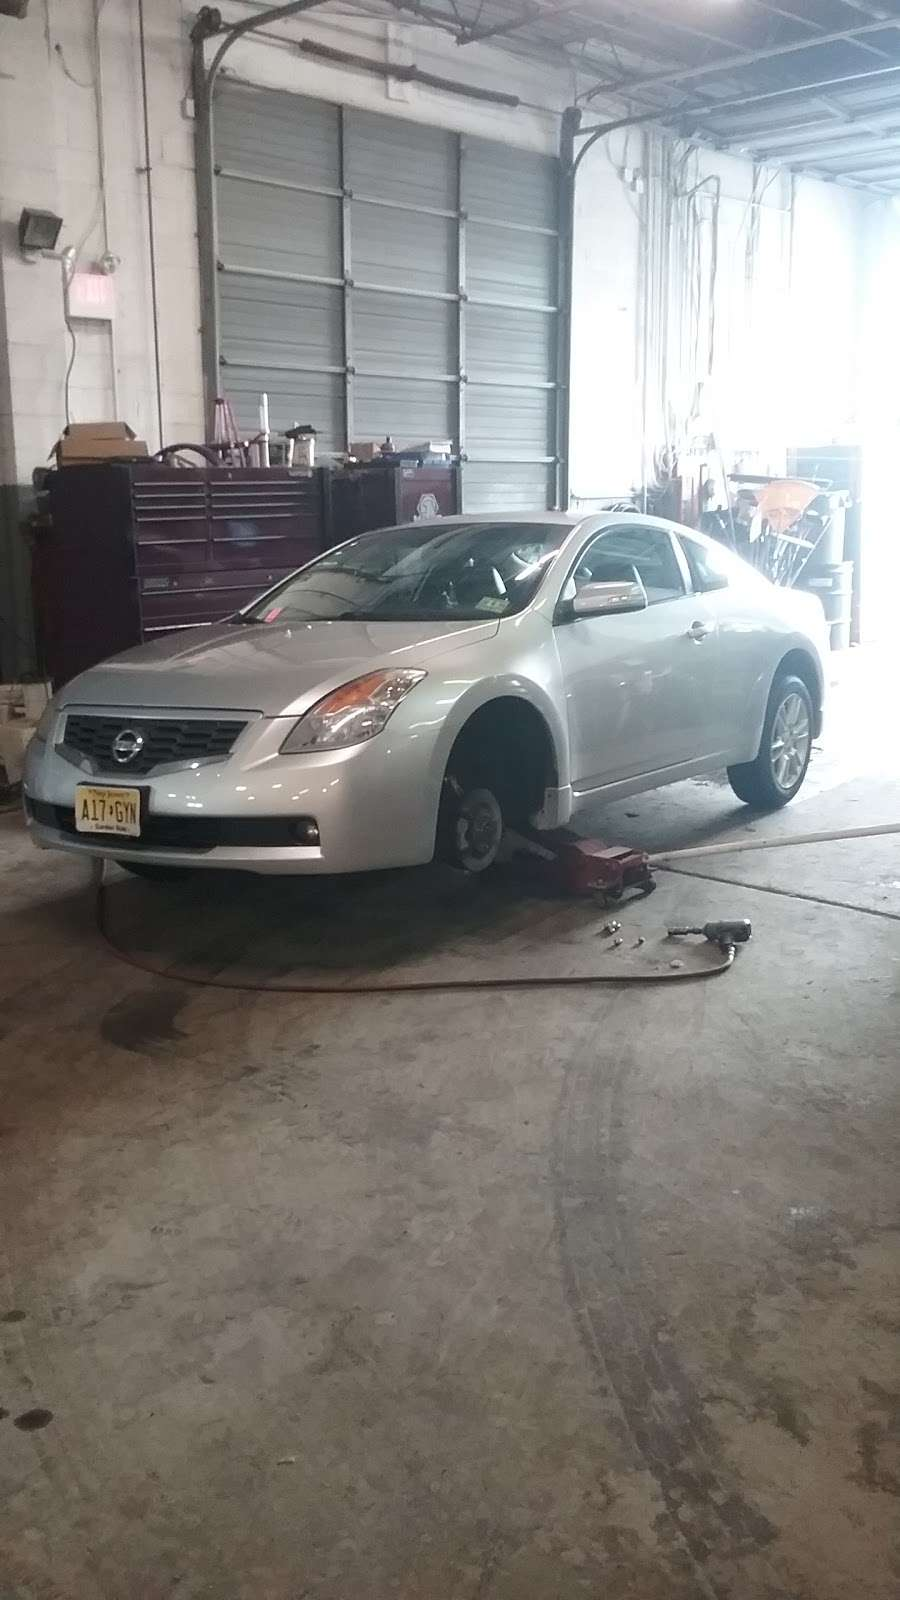 Mustang Stables - car repair  | Photo 4 of 5 | Address: 2260 New York Ave, Bensalem, PA 19020, USA | Phone: (215) 638-0777